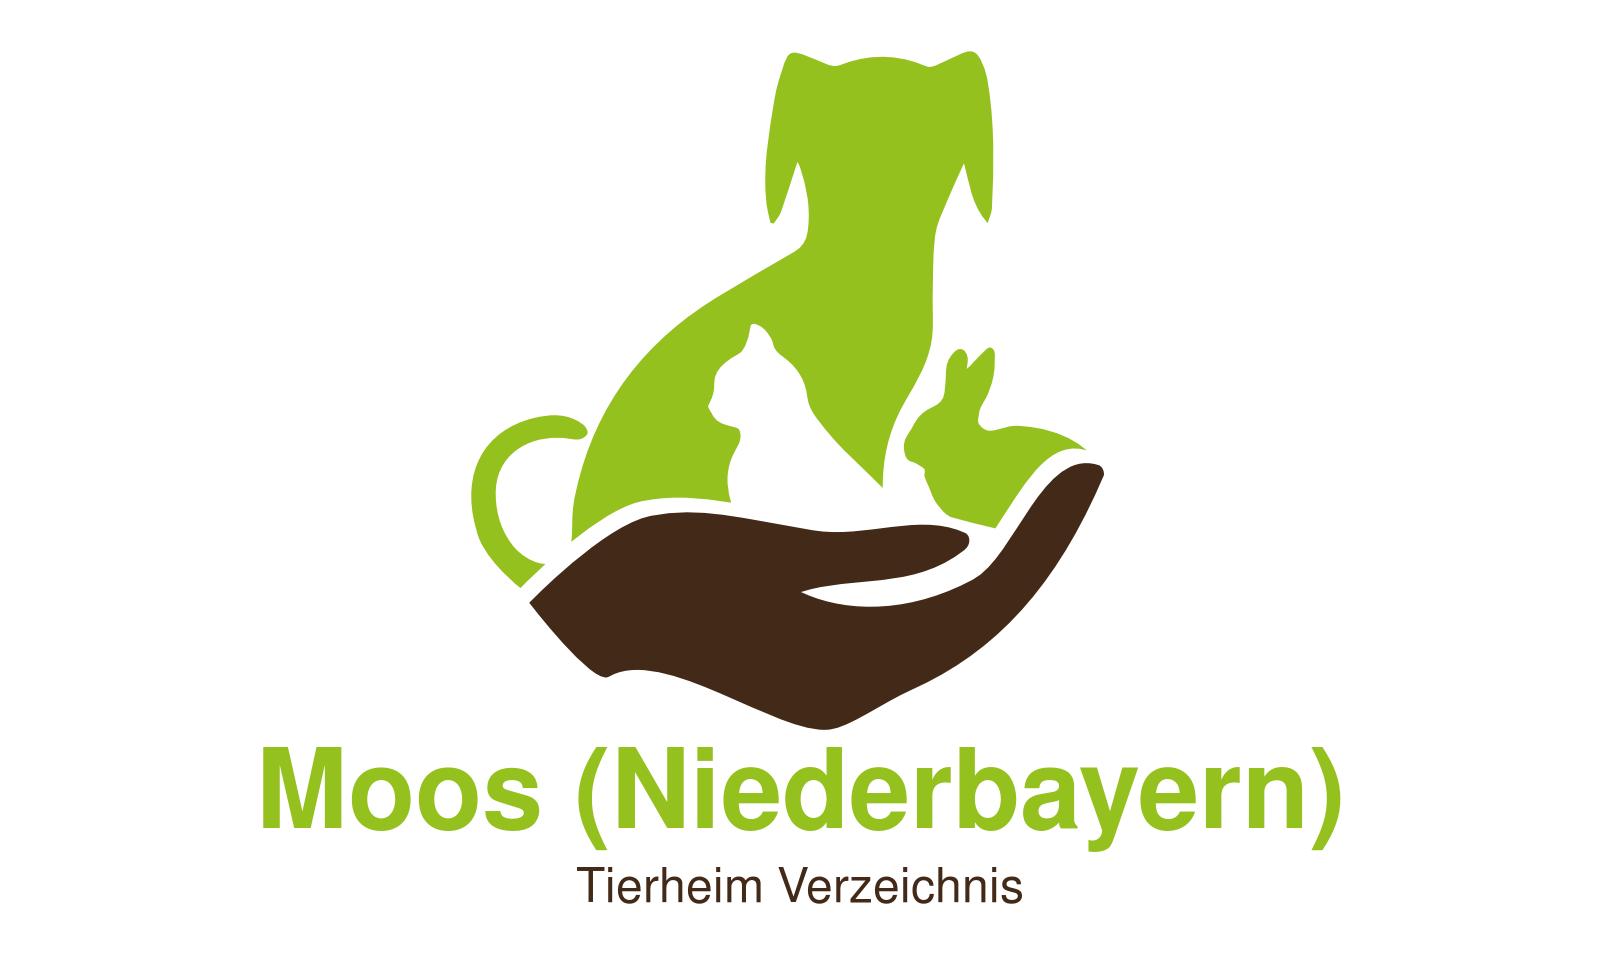 Tierheim Moos (Niederbayern)